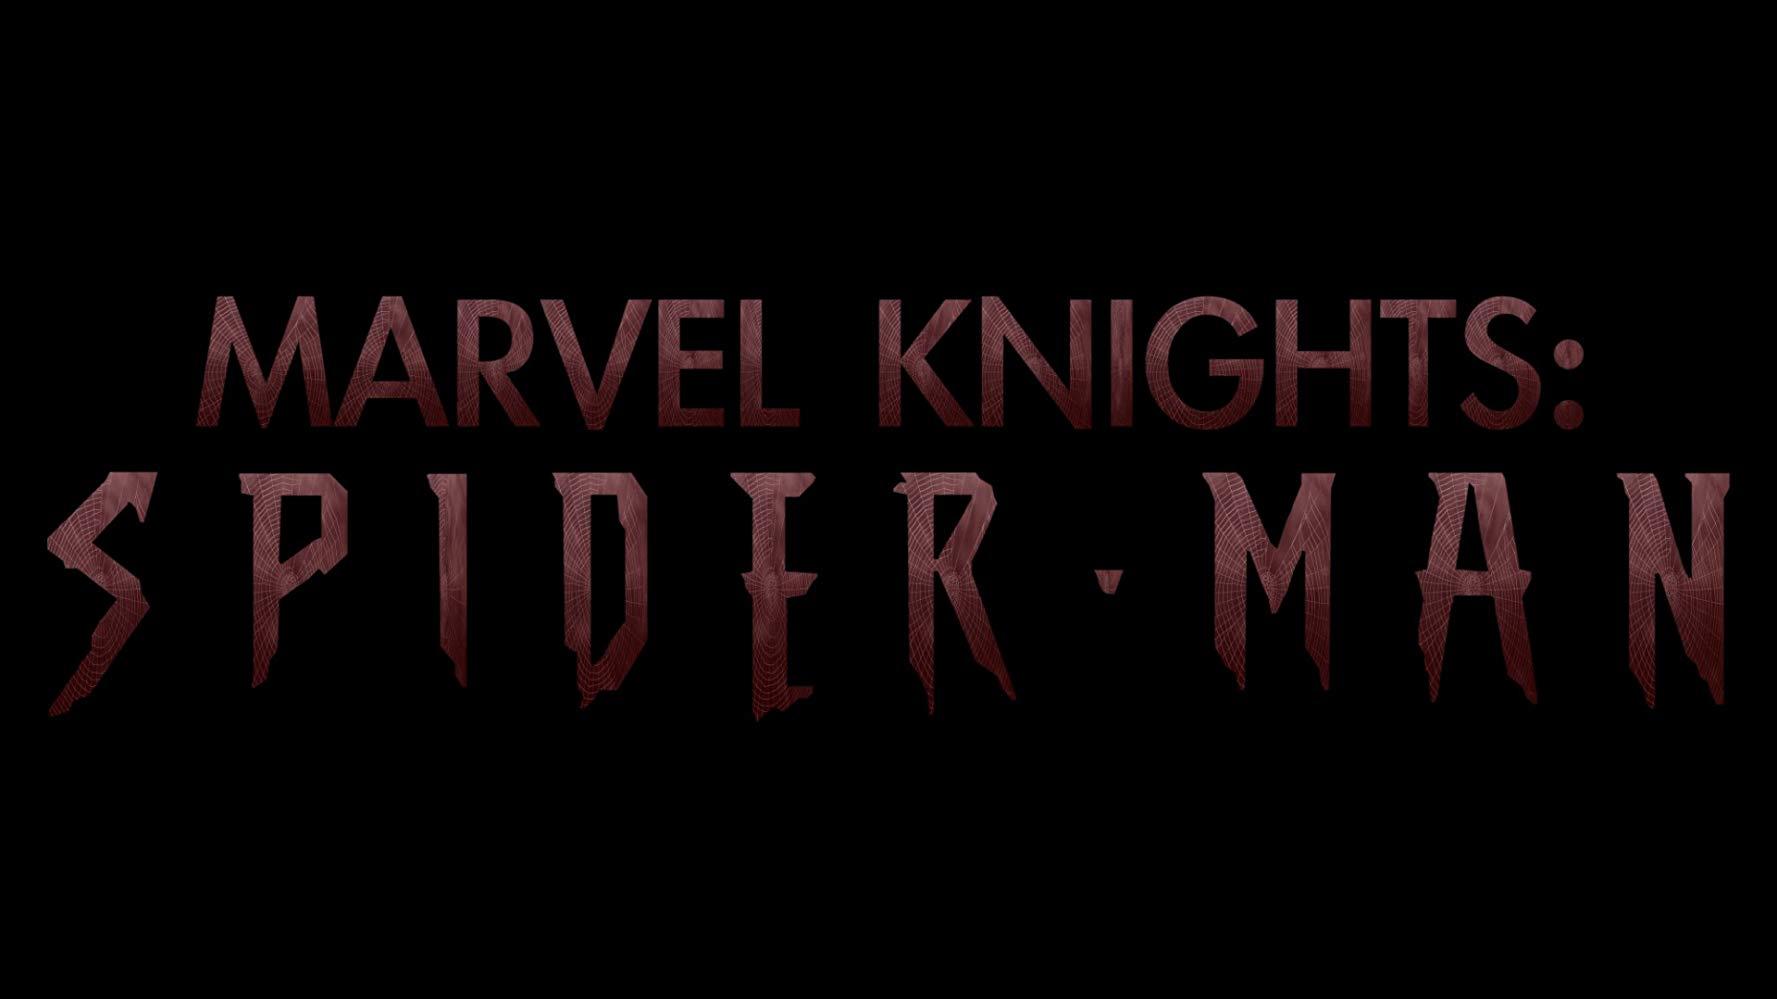 Marvels Spider-Man S02E06 WEB x264-TBS